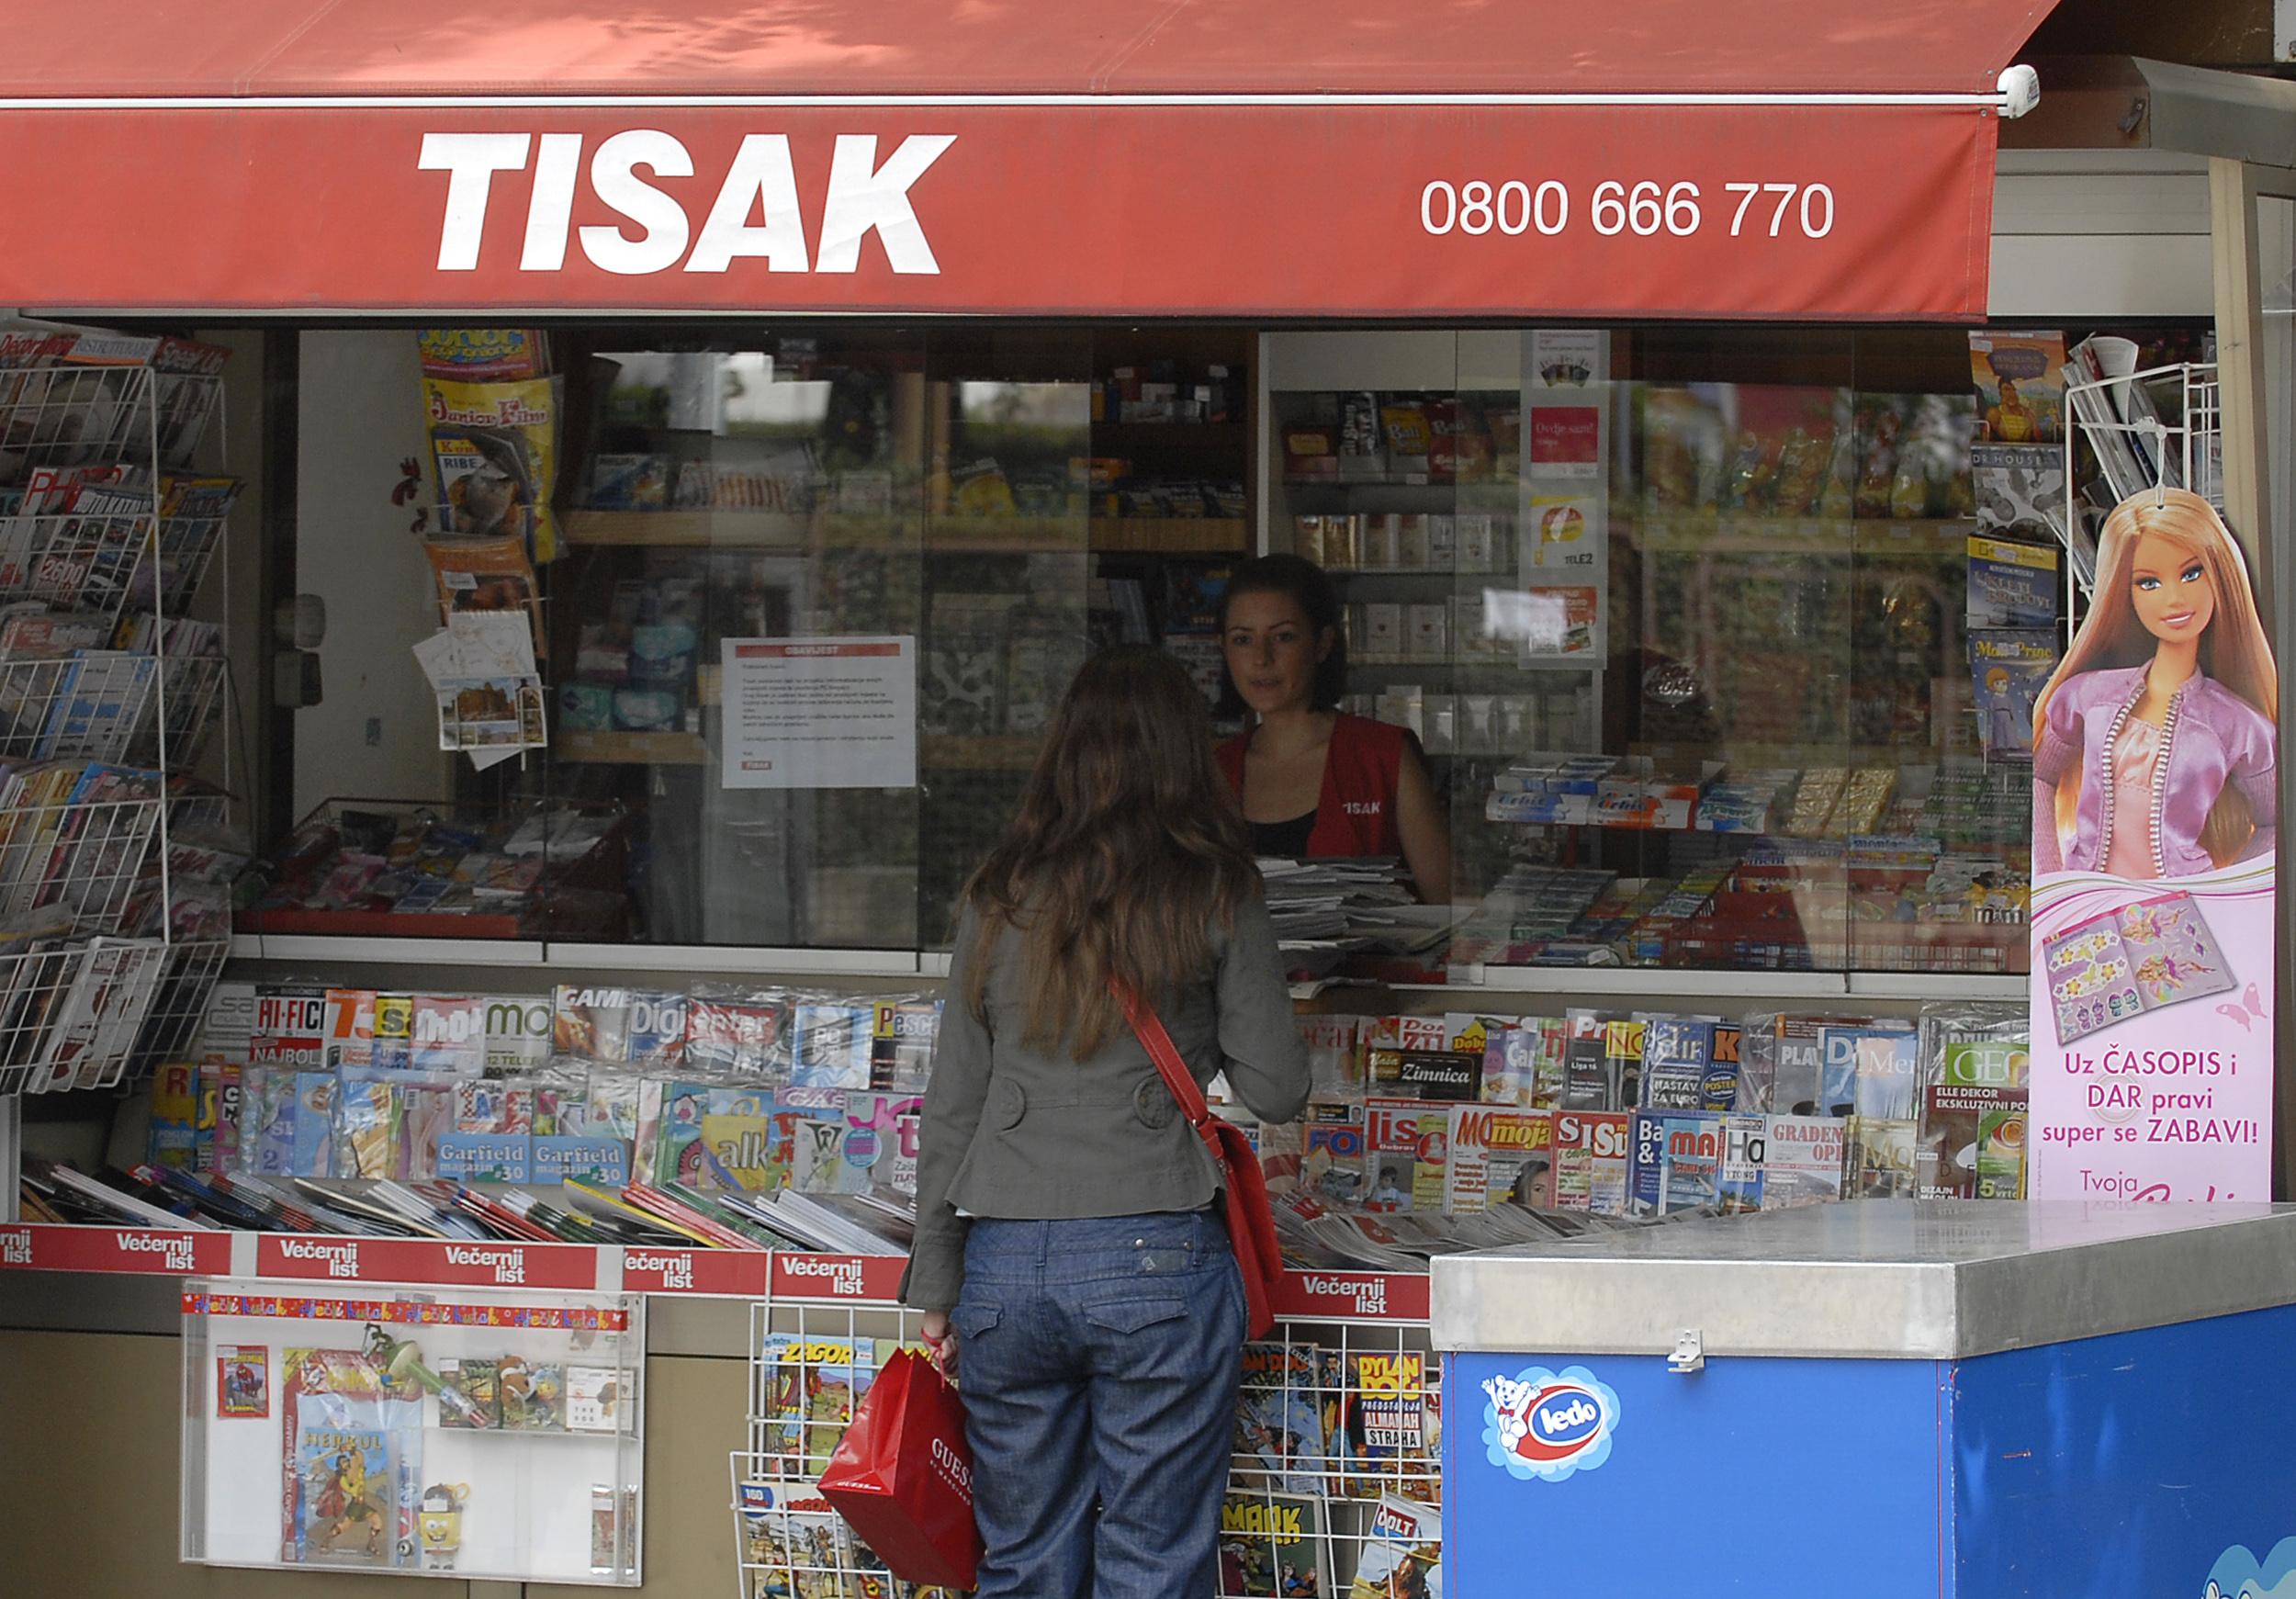 tisak_pljacka-180907